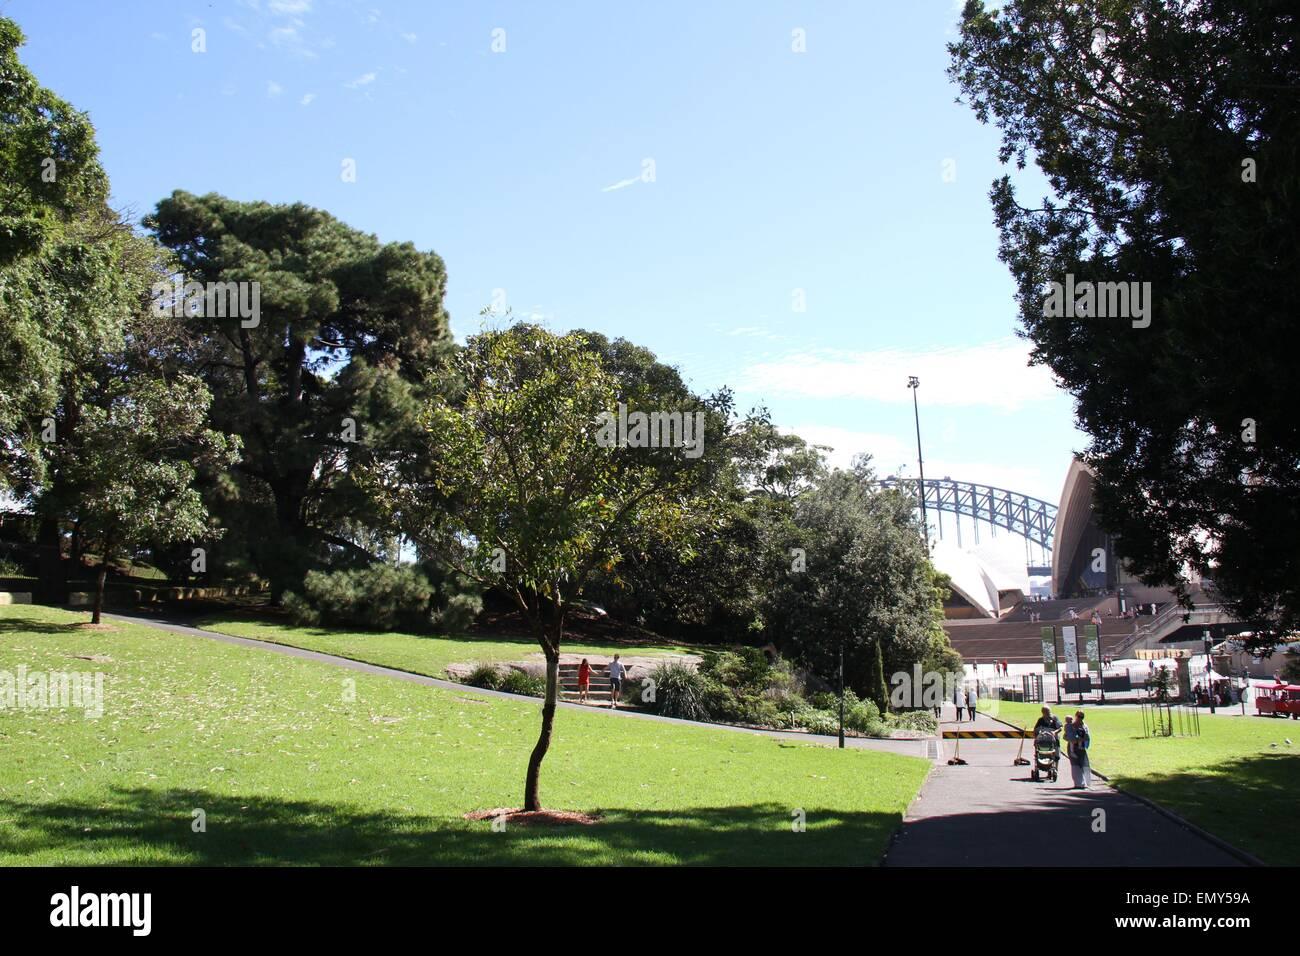 Sydney, Australia. 24 April 2015. The Royal Botanic Garden. Credit: Richard Milnes/Alamy - Stock Image